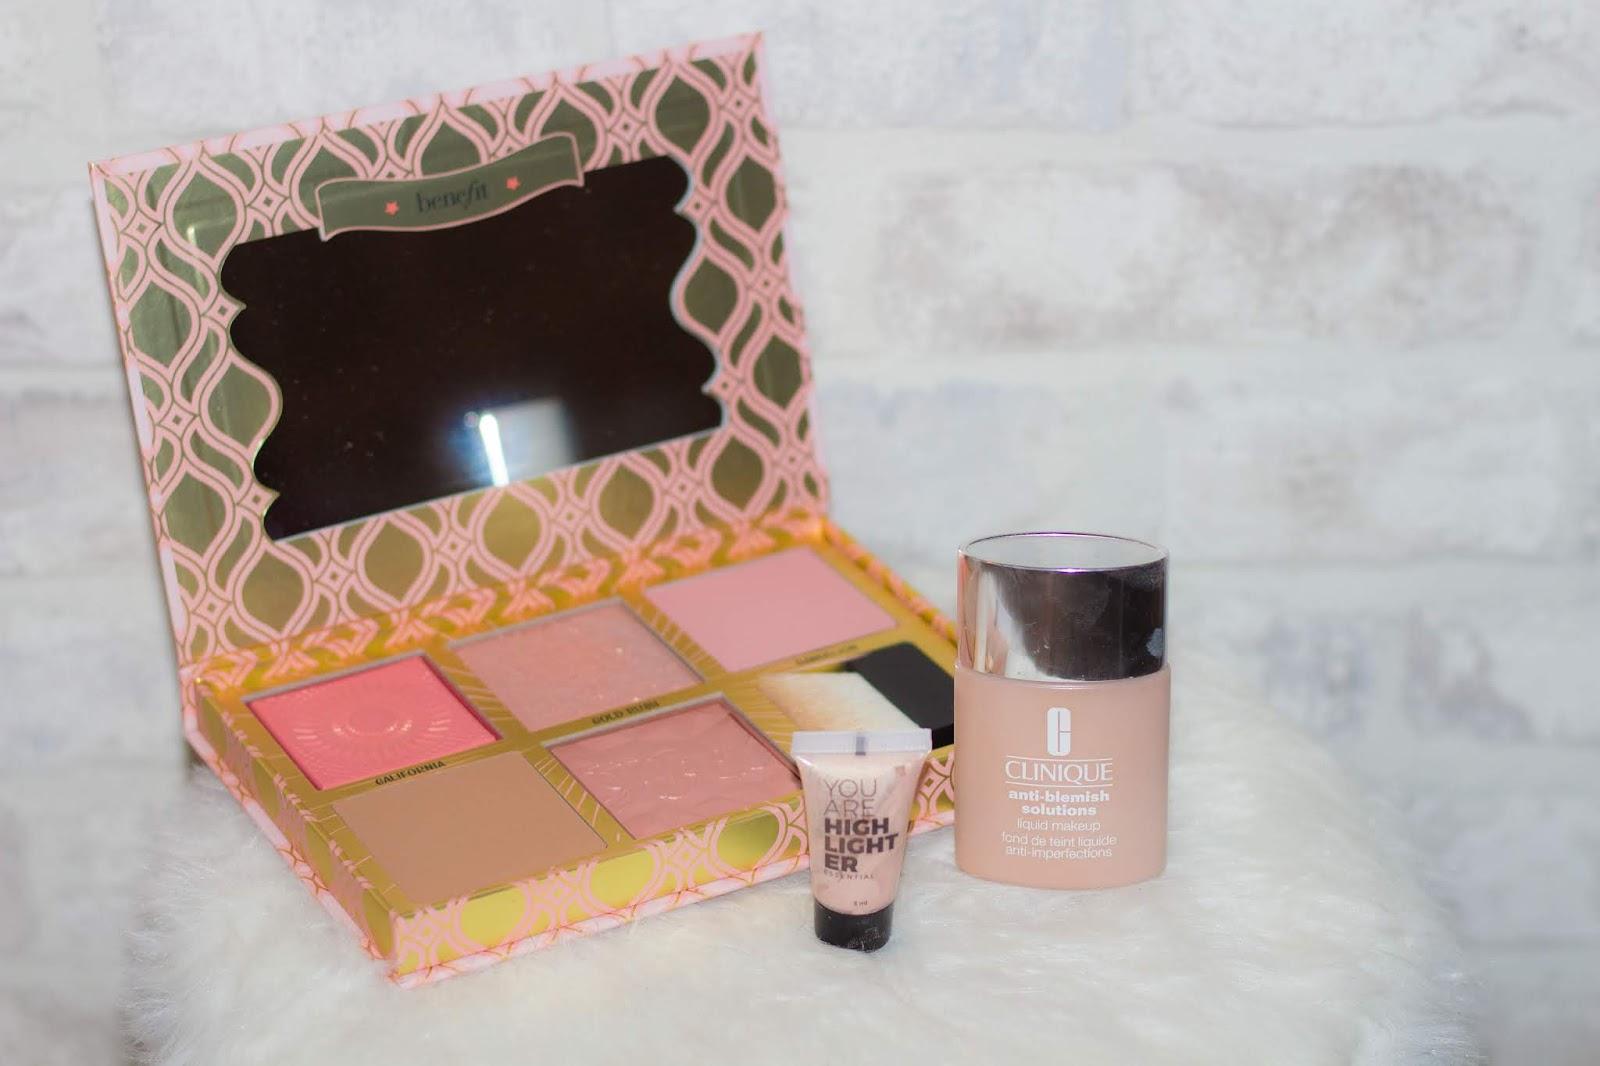 maquillage - teint - benefit - clinique